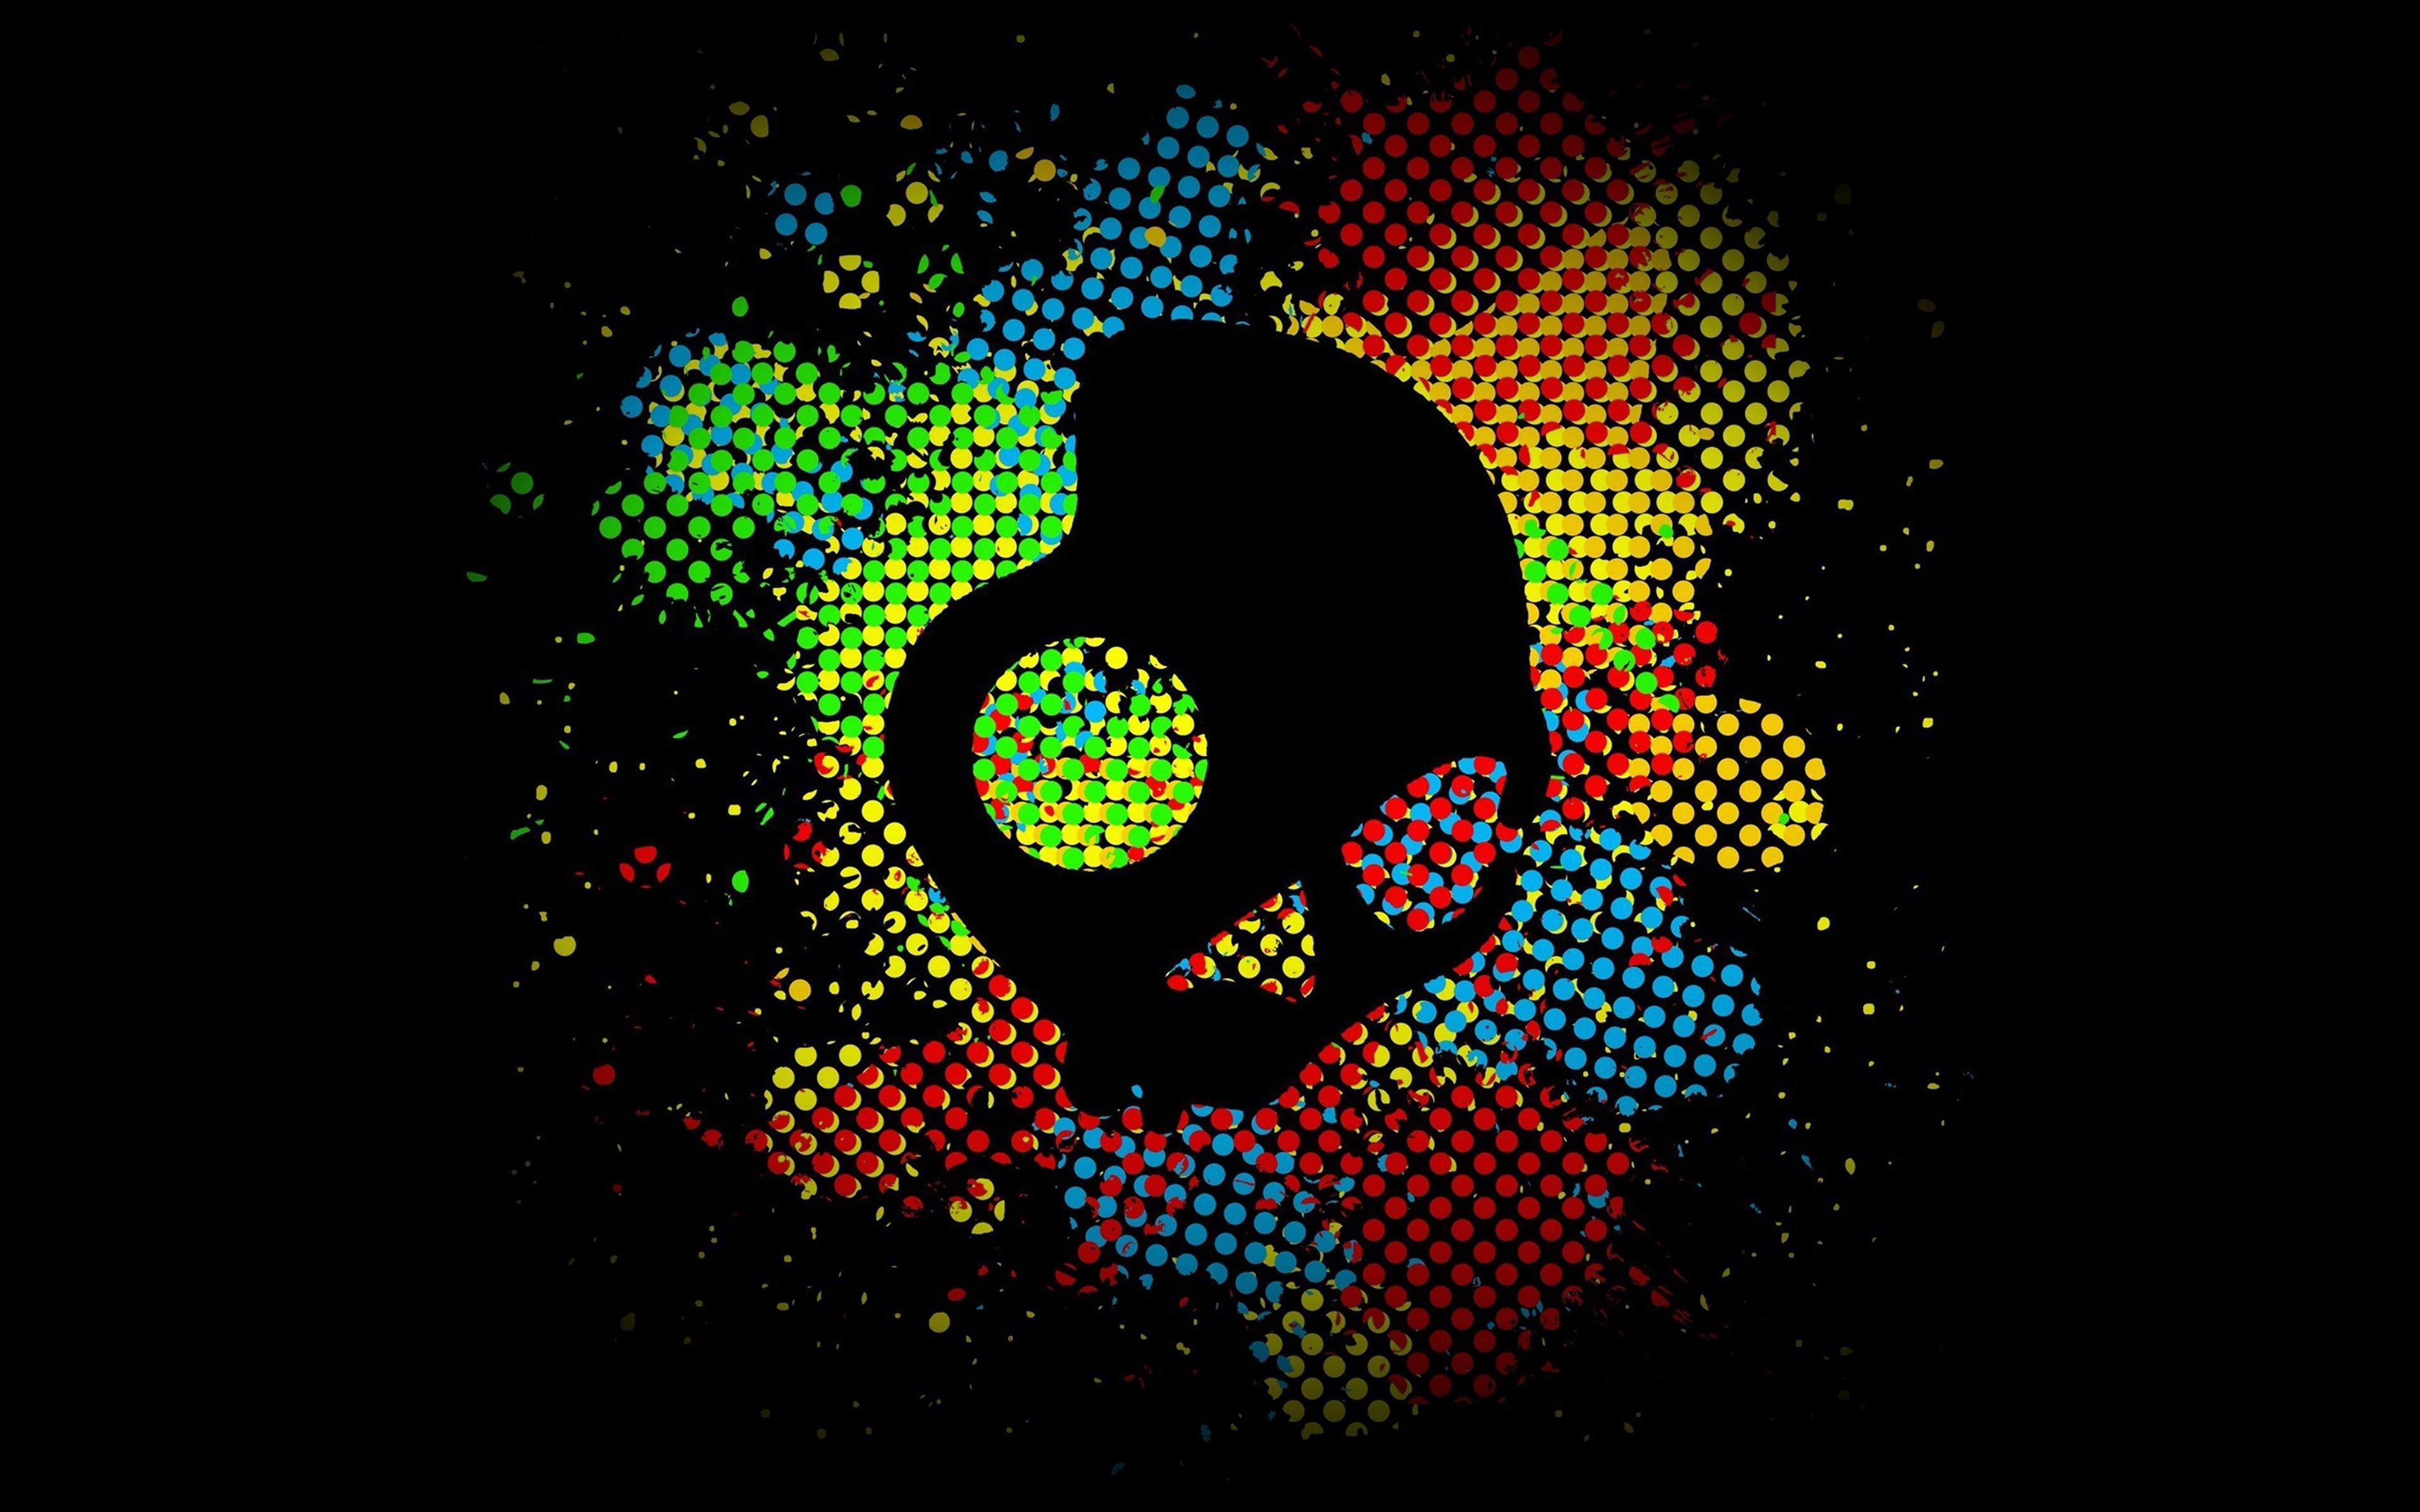 Skull candy hd logo 4k wallpapers images backgrounds - Skull 4k images ...